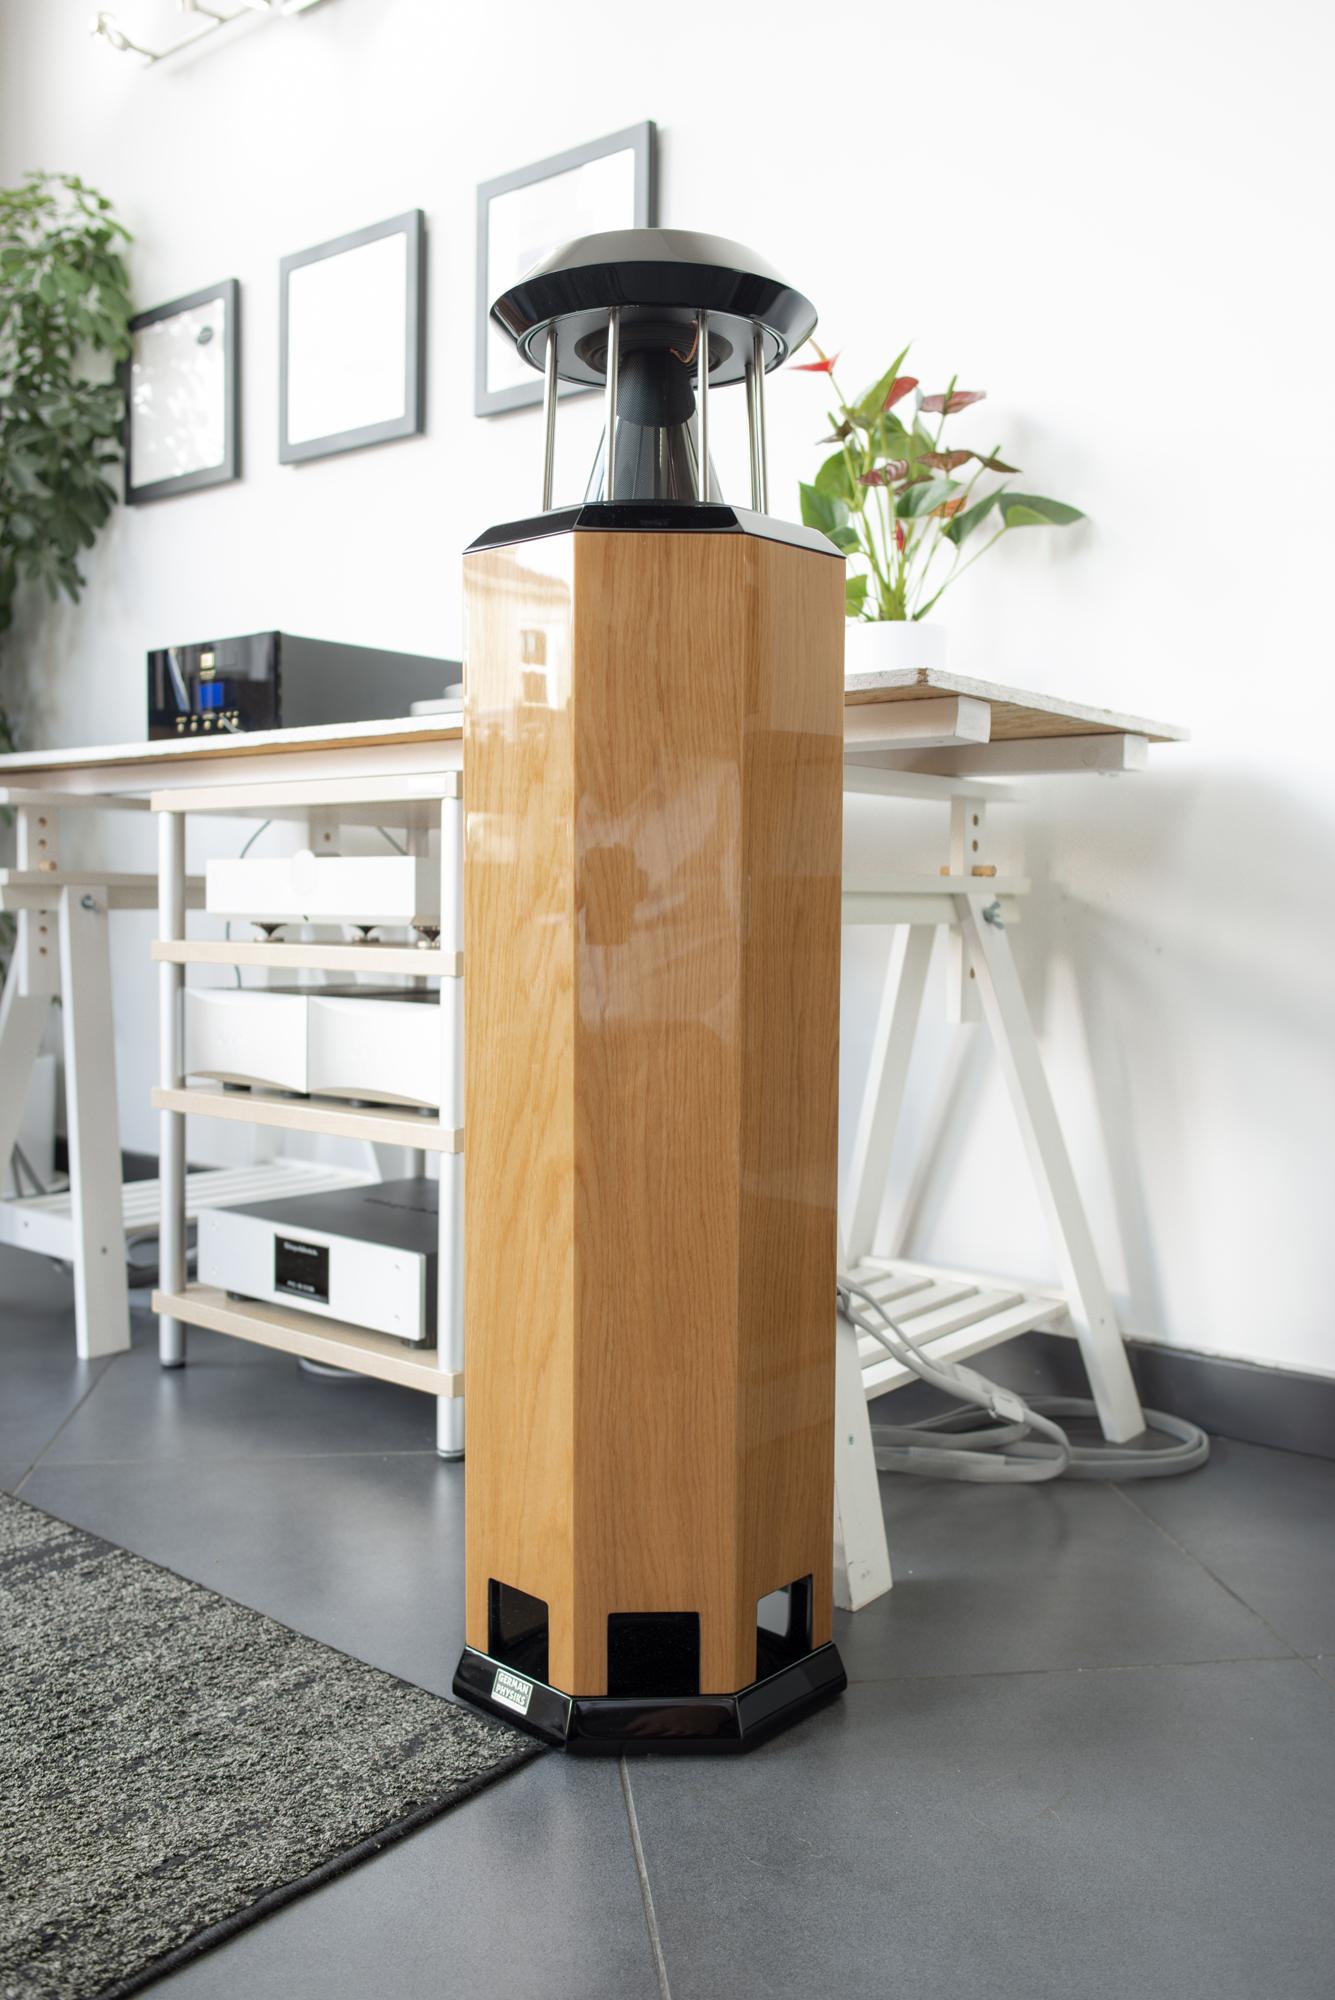 HRS-130 loudspeaker in high polish oak | Audio-philia, Edinburgh, Scotland